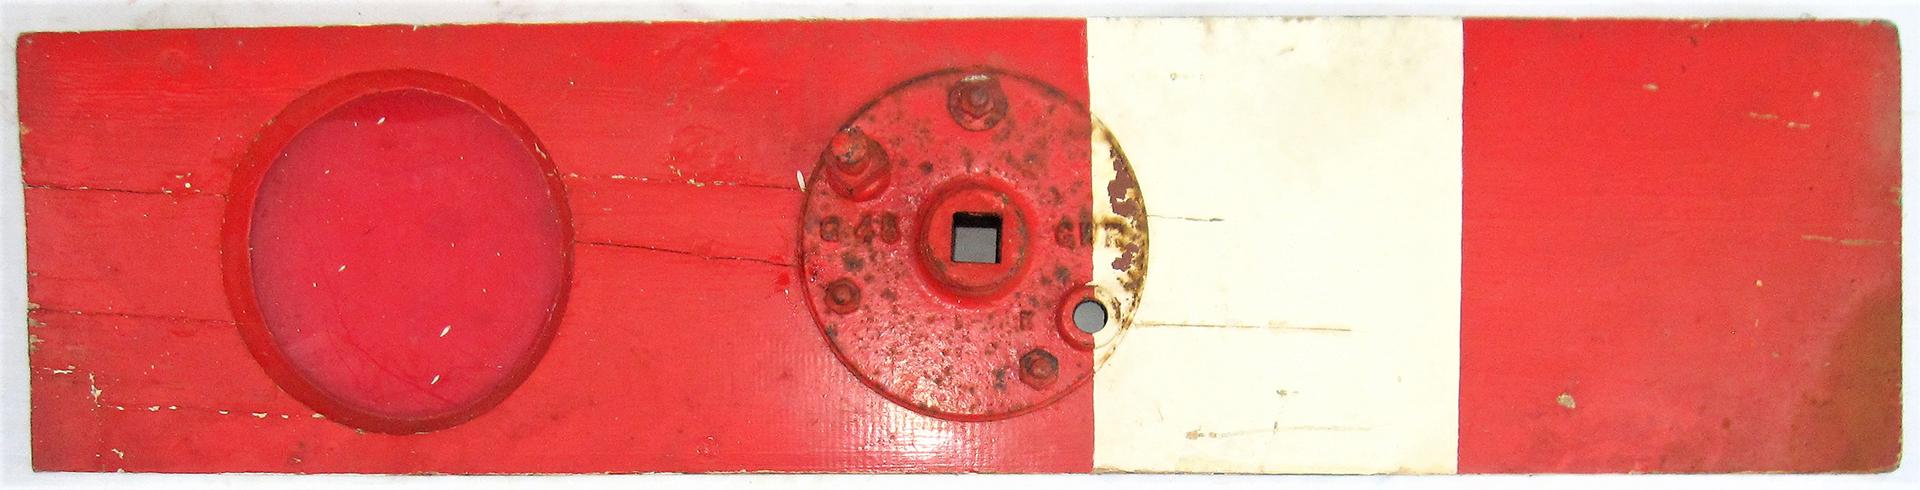 GWR centre balance Home Signal Arm. Complete with red lens and centre boss cast GWR. Good original